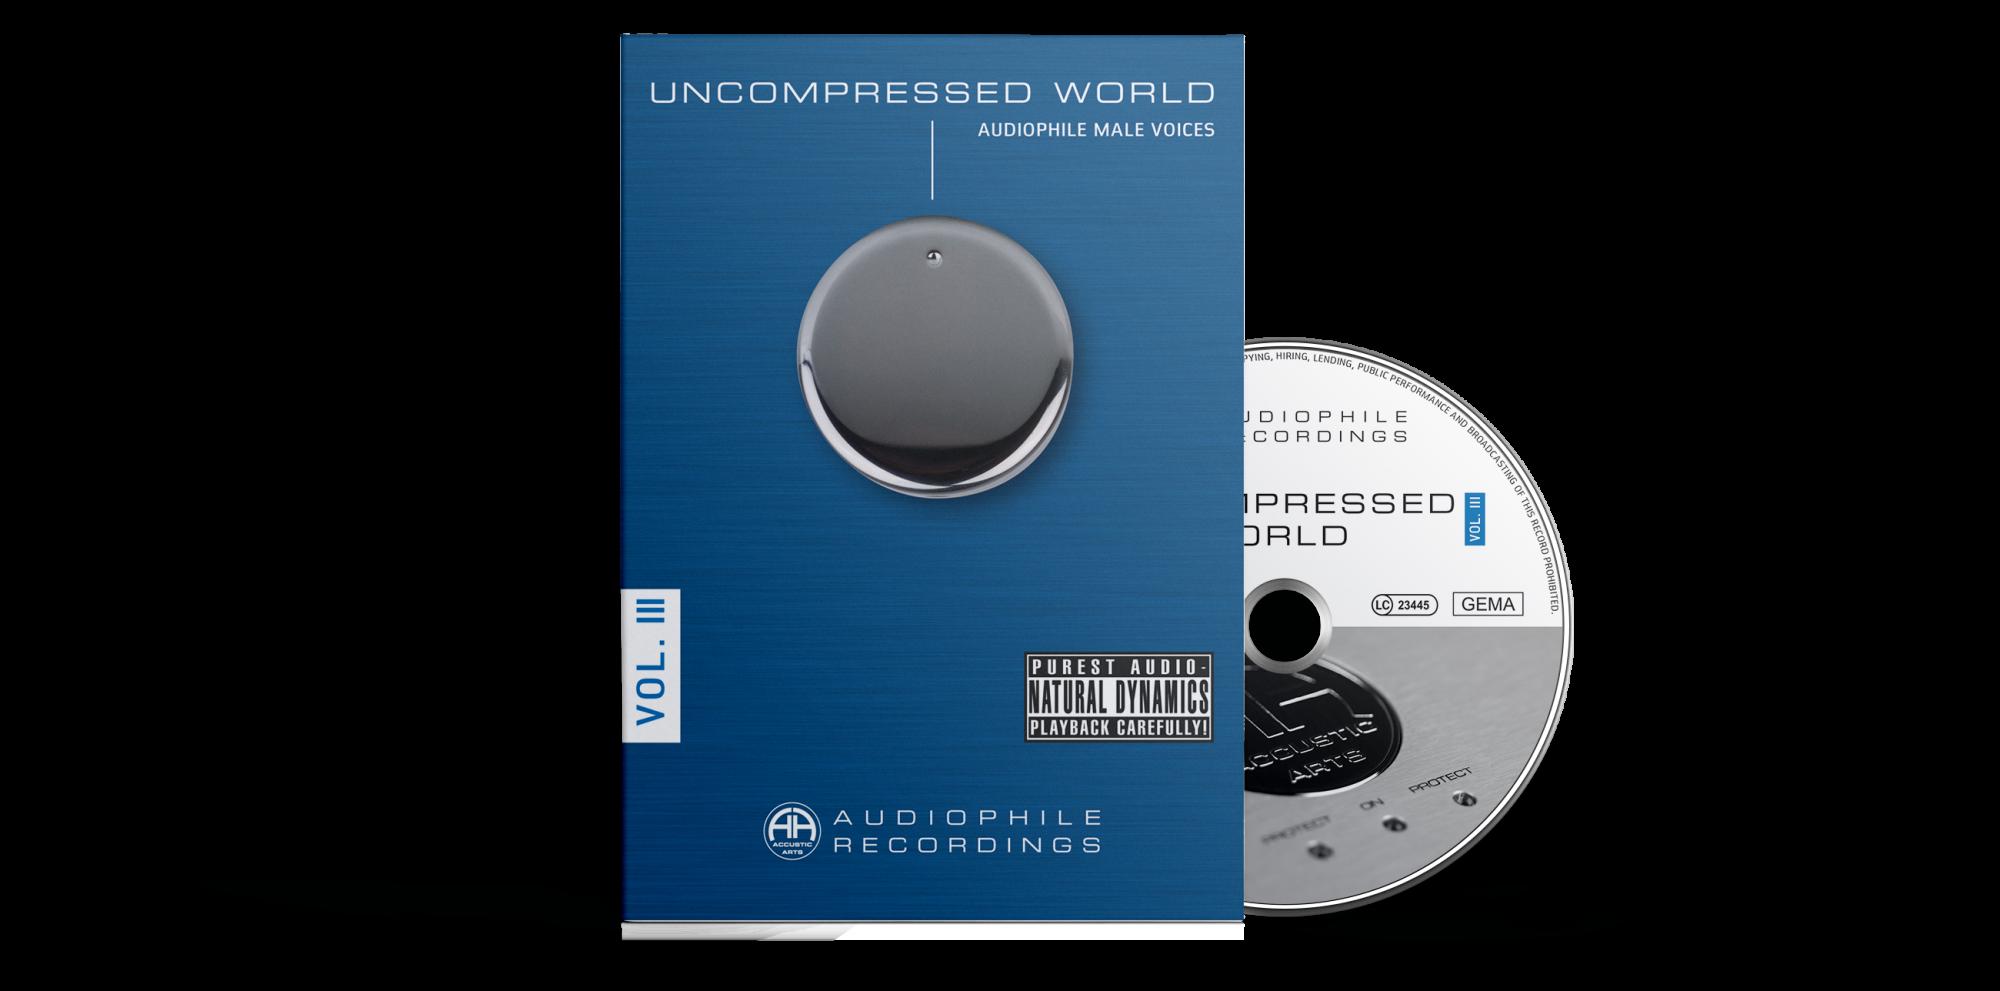 UNCOMPRESSED WORLD VOL.III